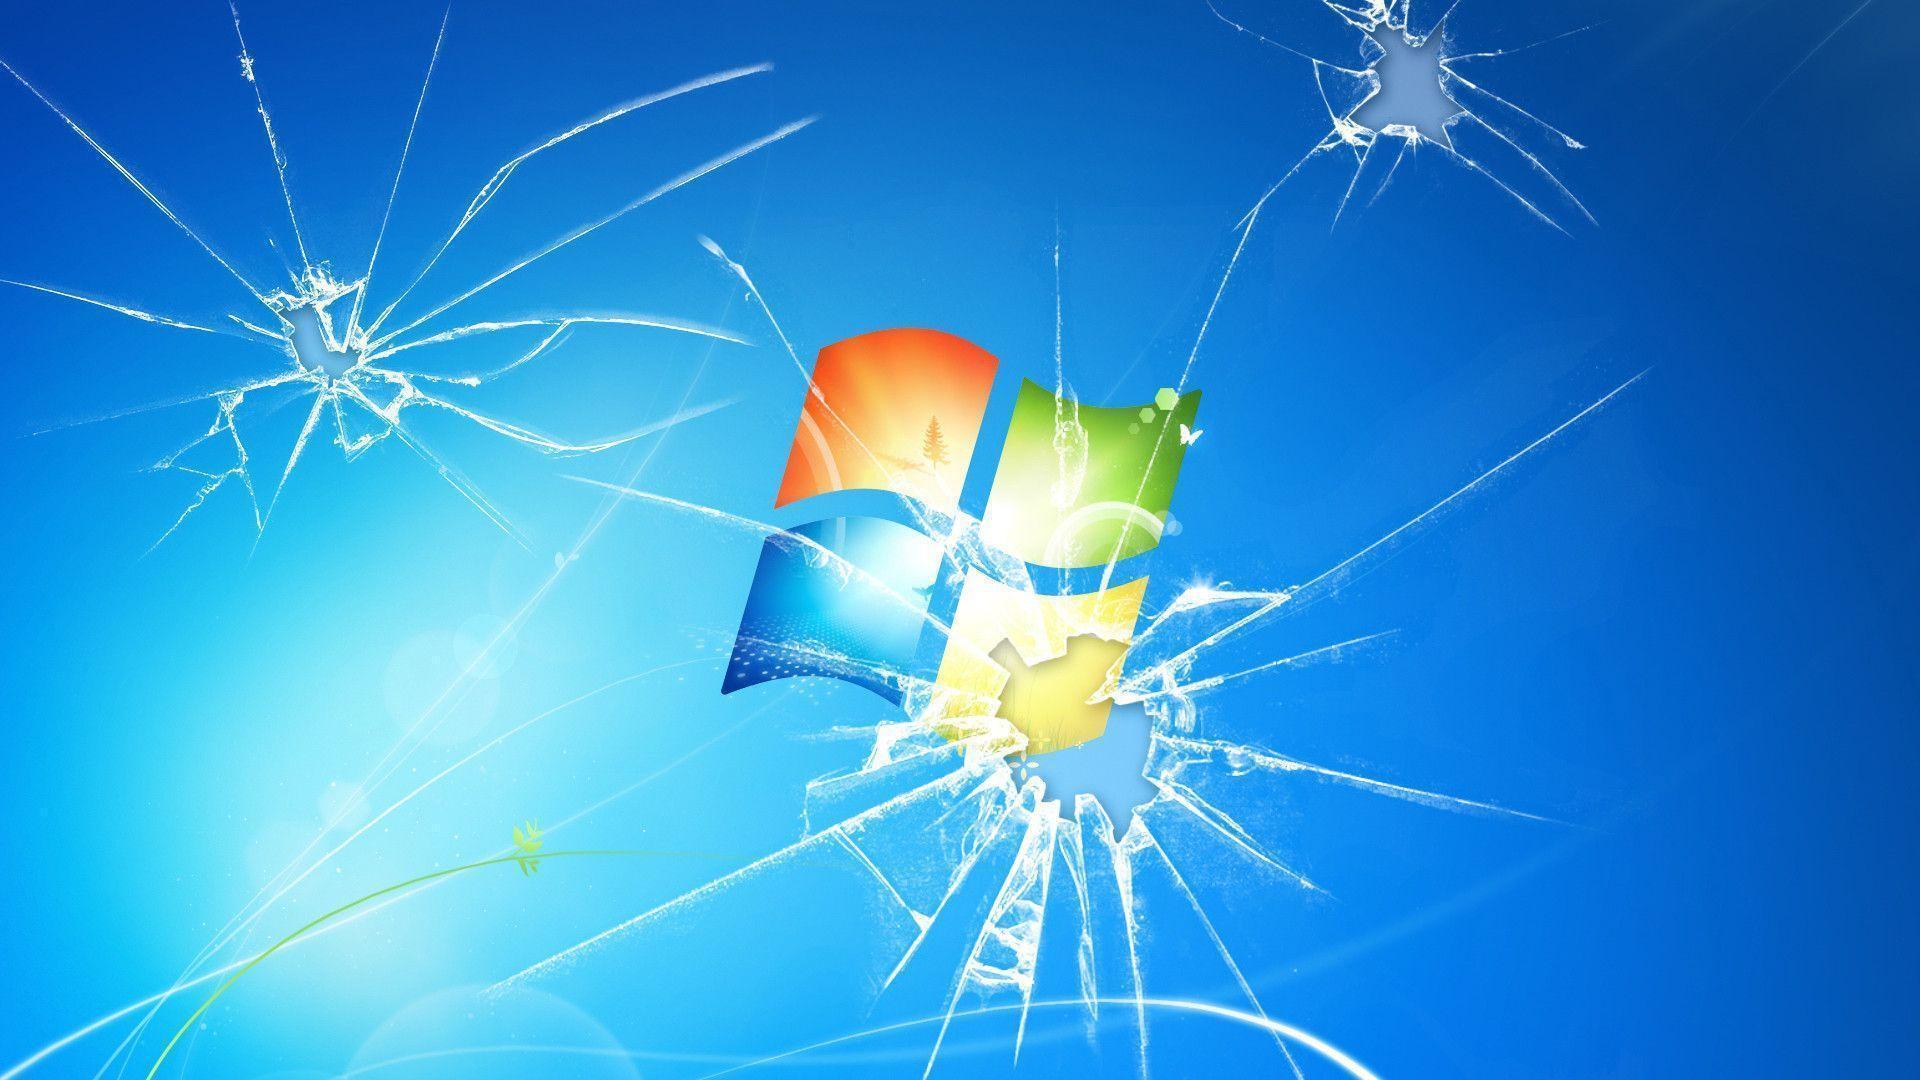 cracked computer screen wallpaper windows - photo #9